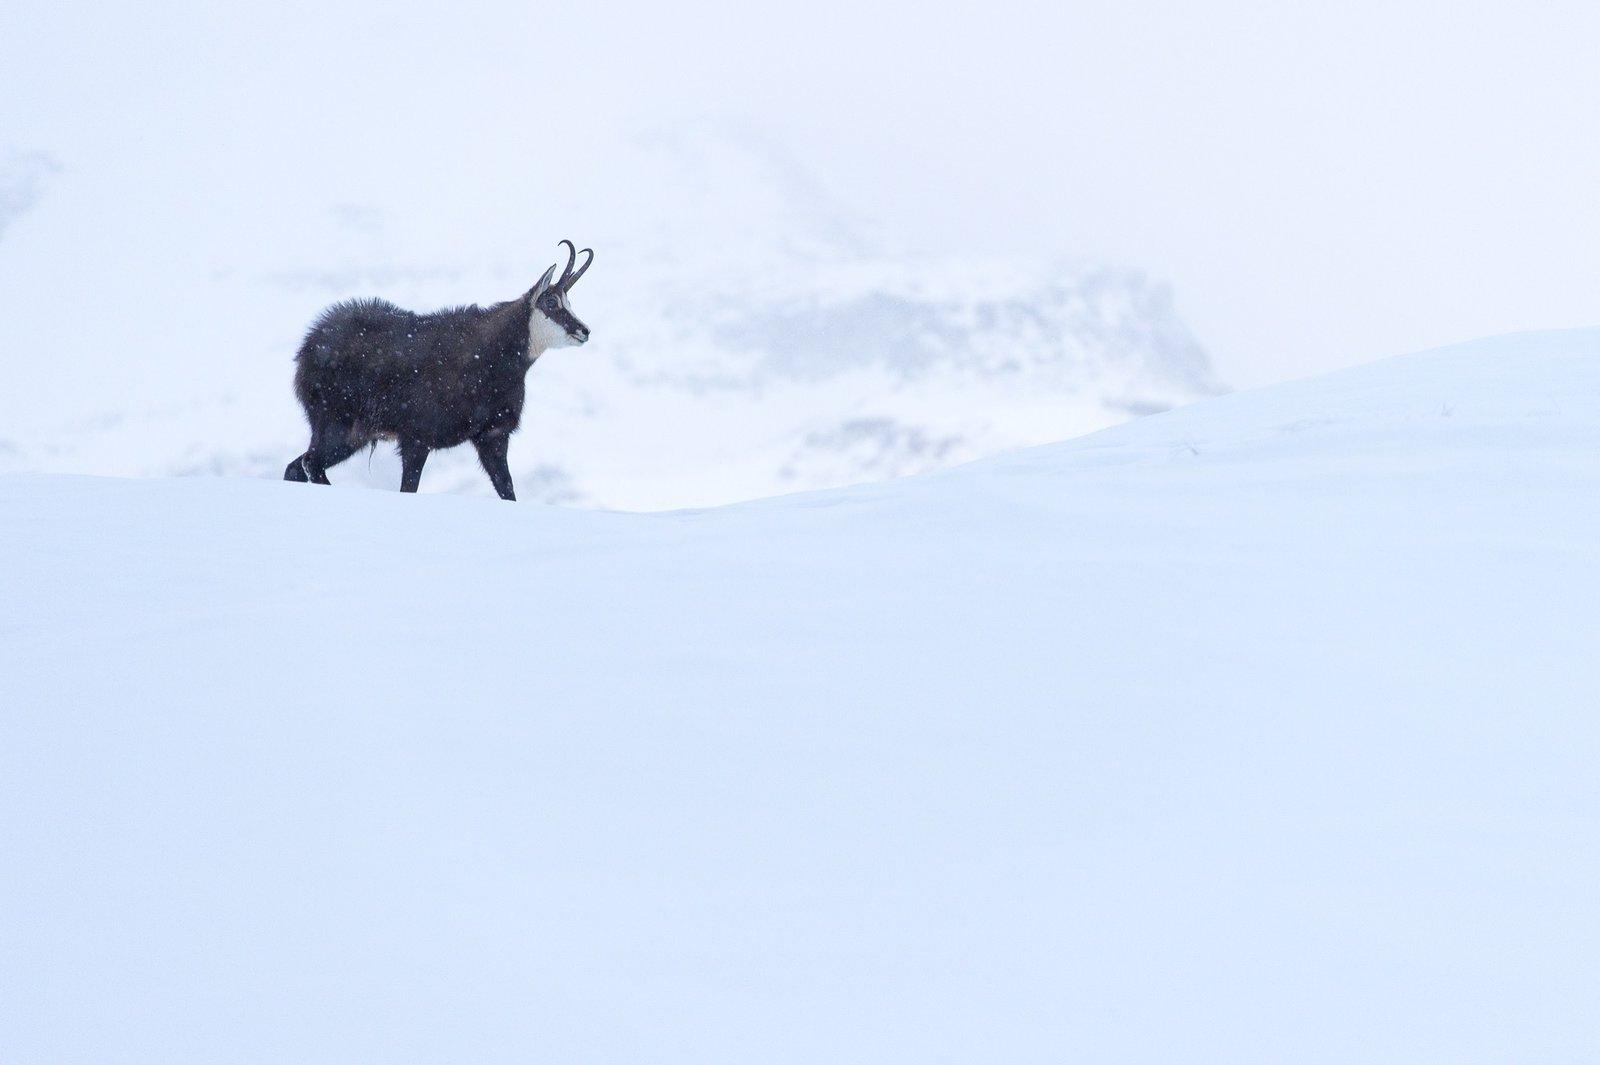 #alpinemodern #wildpresence #italianalps Photo by Martin Dellicour  Wild Presence